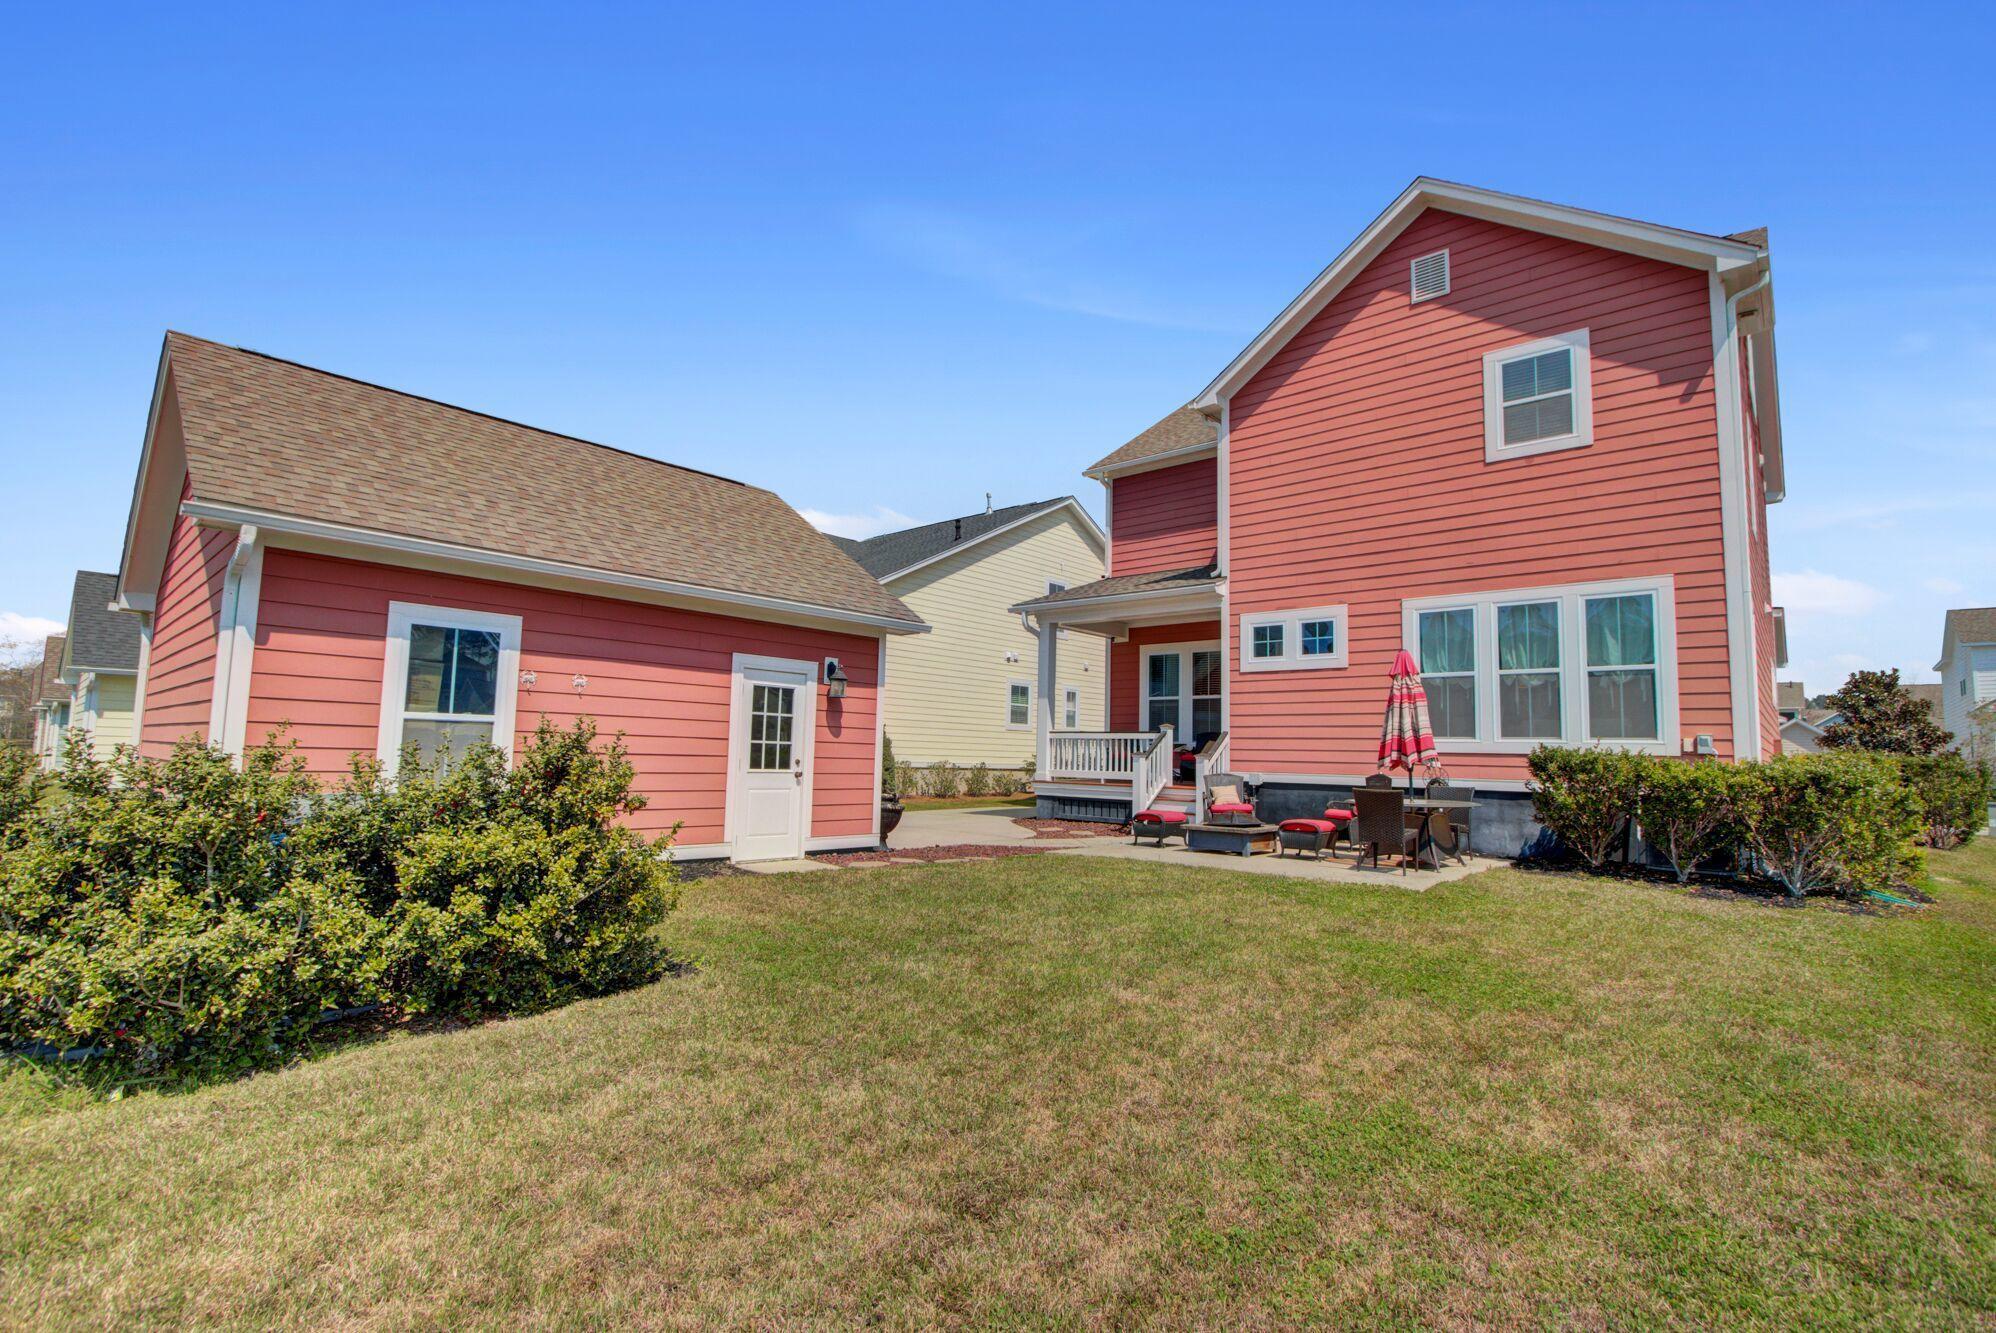 Carolina Park Homes For Sale - 3614 Shutesbury, Mount Pleasant, SC - 0